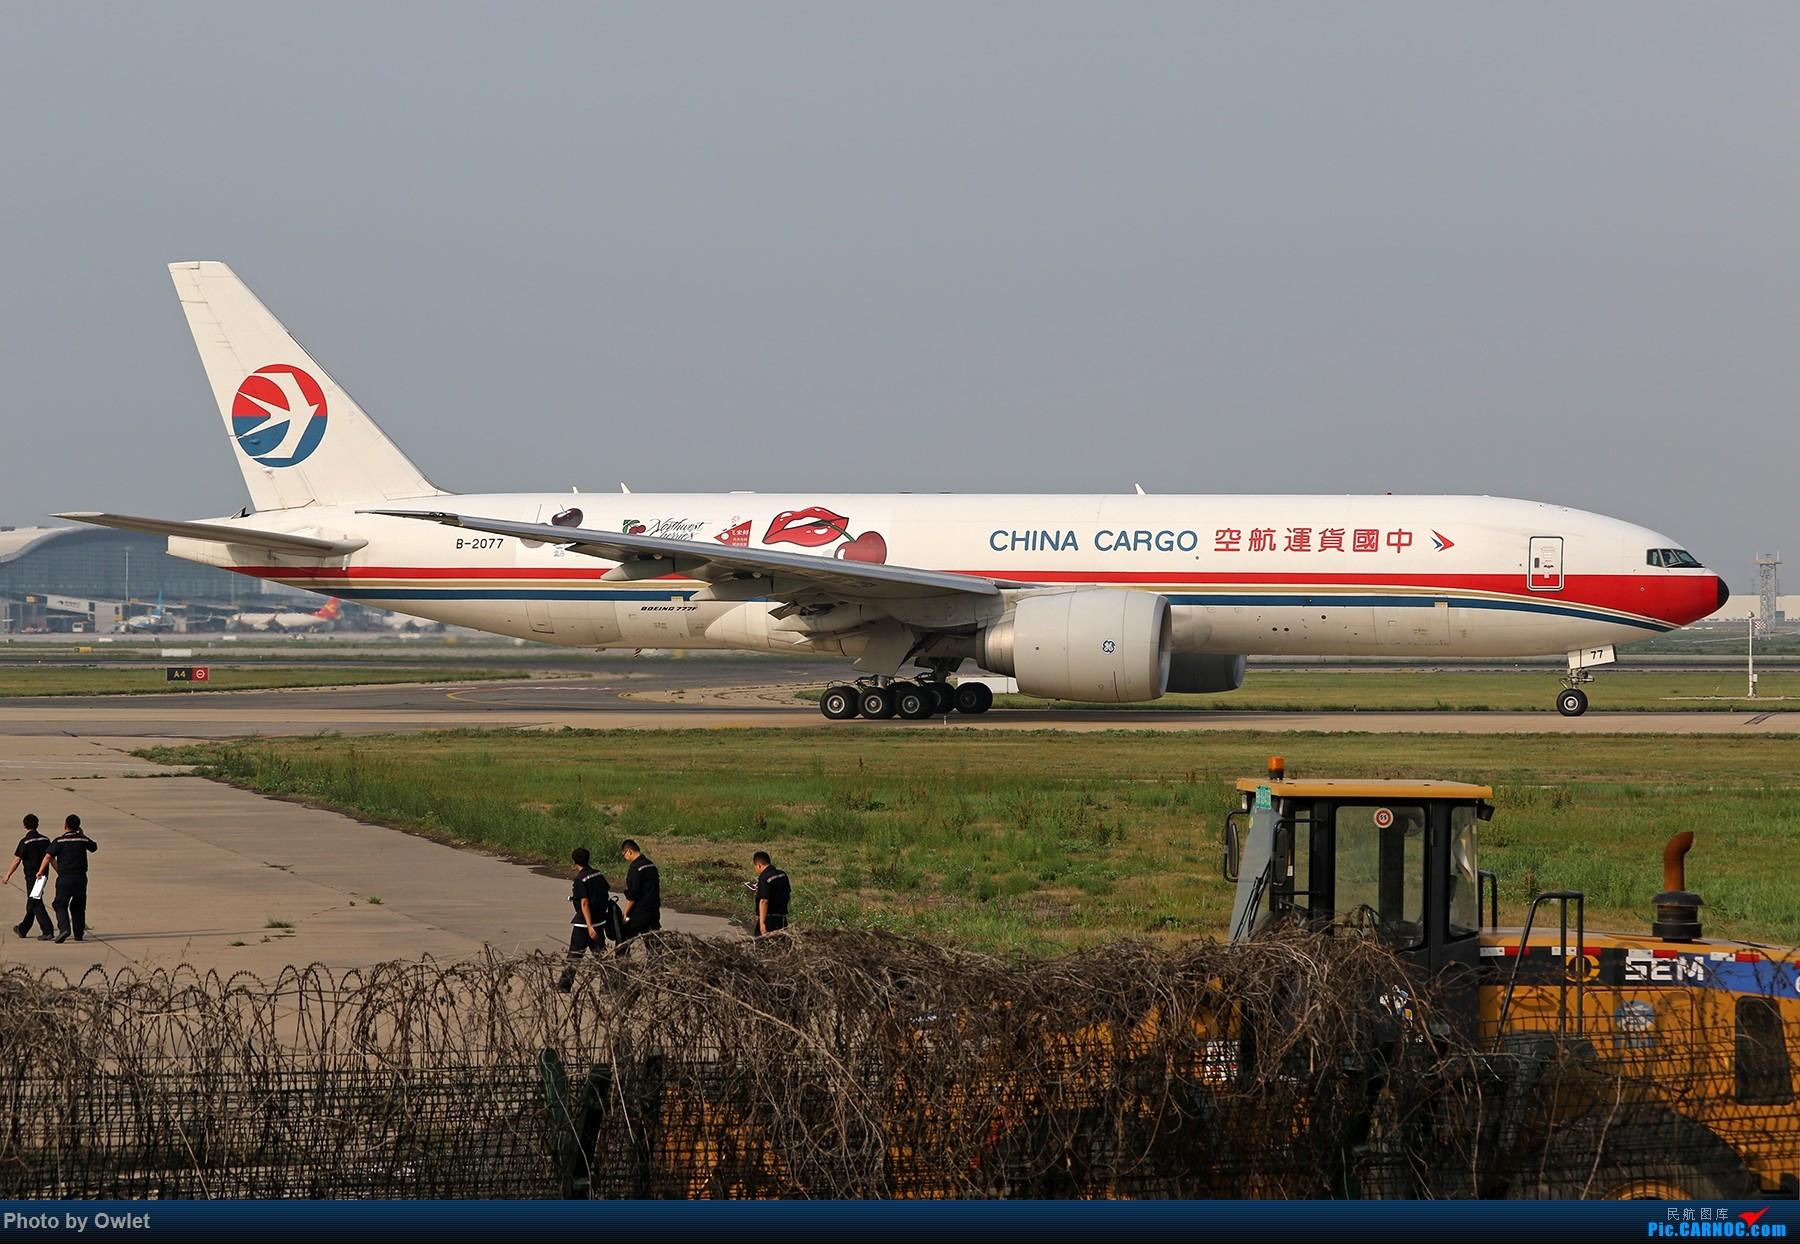 Re:[原创]【TSN】中国货运B-2077彩绘卡狗 BOEING 777-200 B-2077 中国天津滨海国际机场